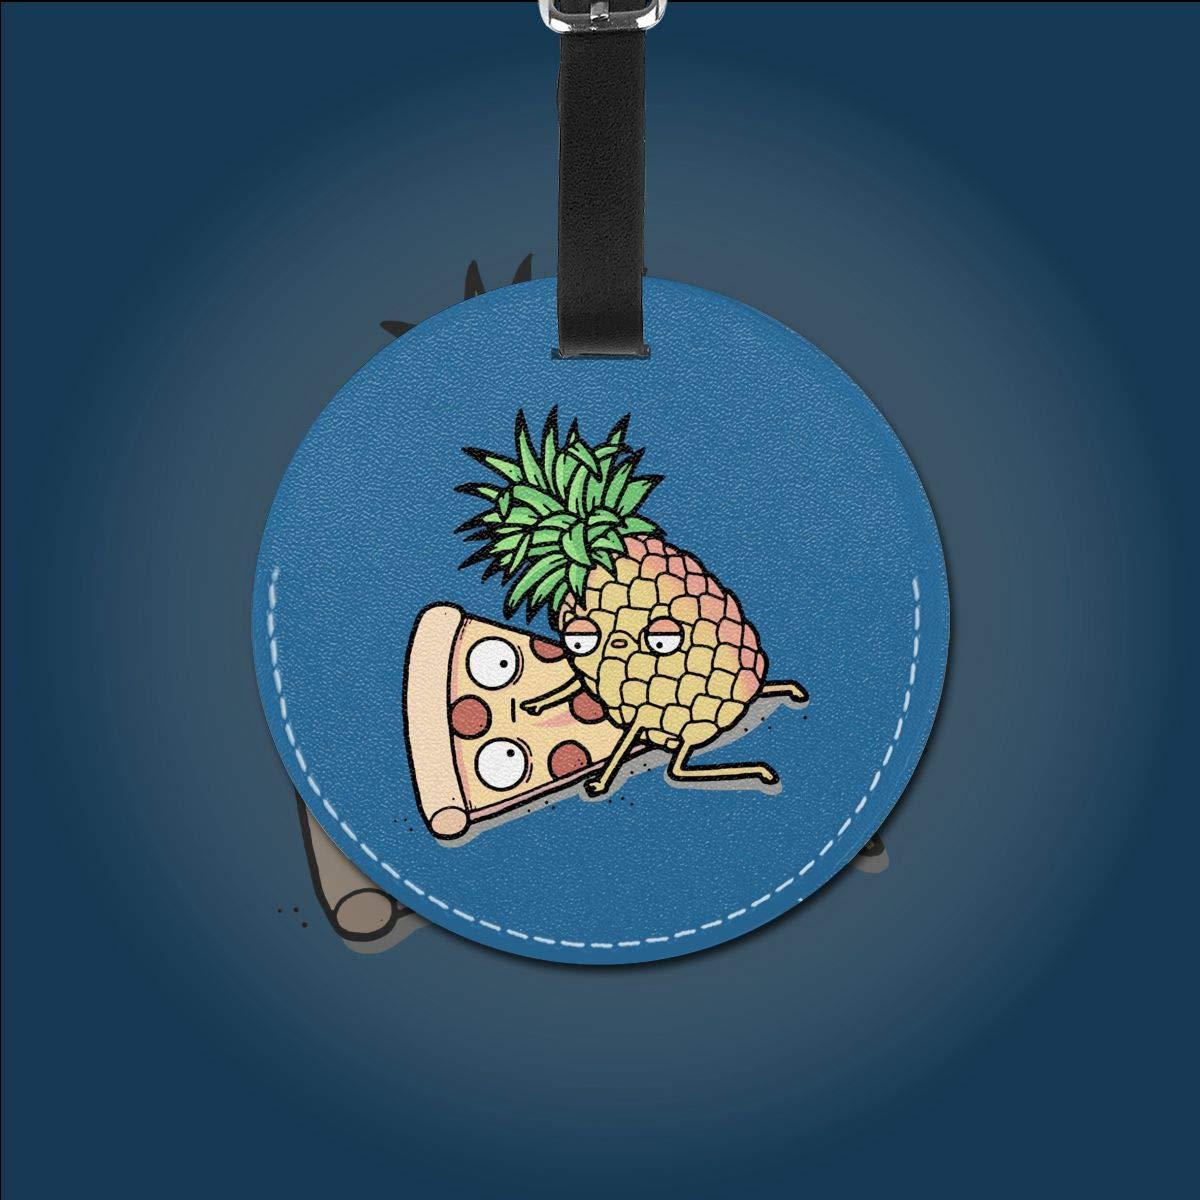 Pineapple Pizza Pu Leather Double Sides Print Round Luggage Tag Mutilple Packs 1pcs,2pcs,4pcs